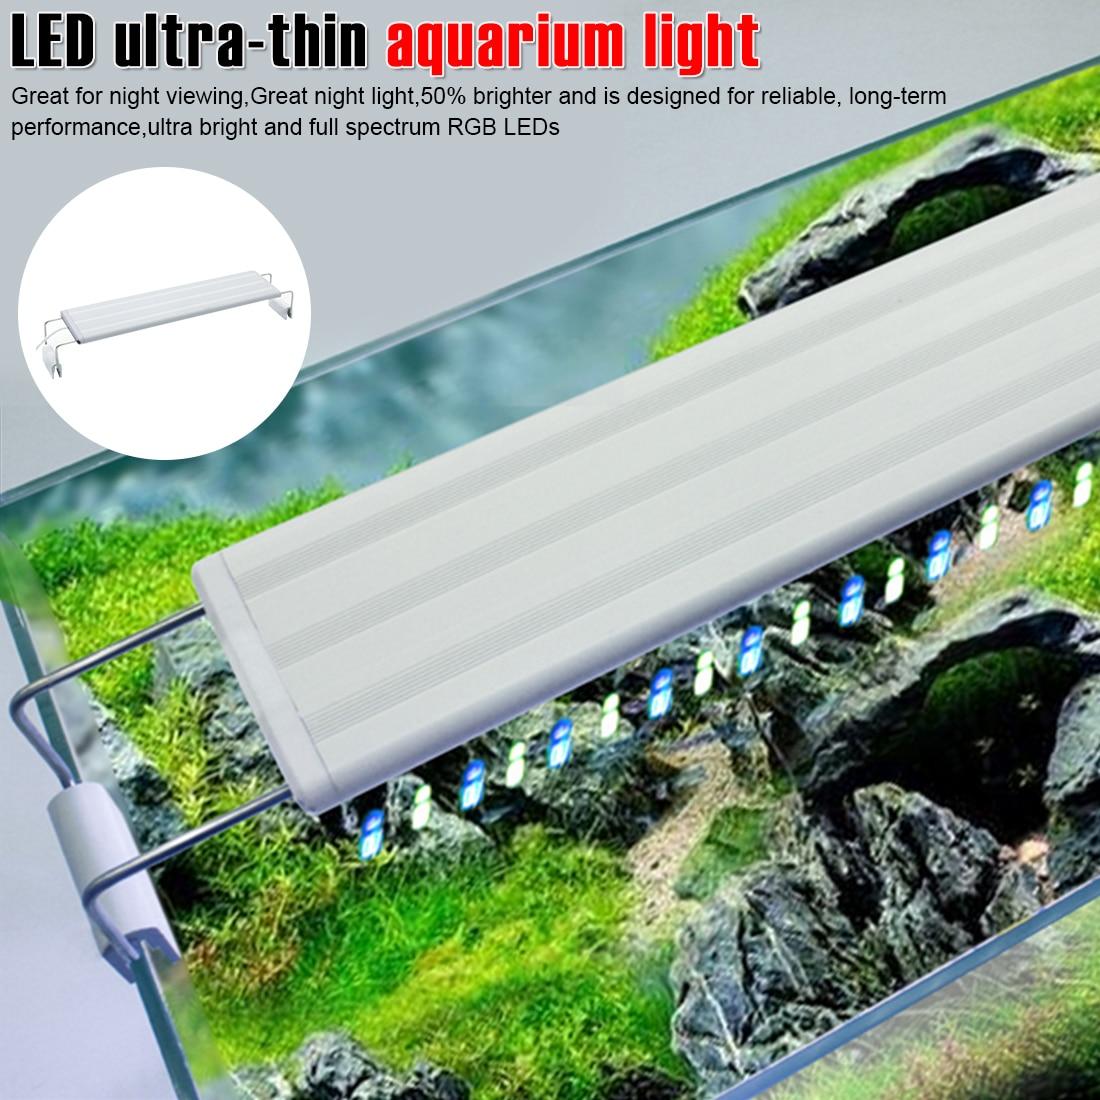 20-70CM Extensible Waterproof Clip-on Lamp  Fish Tank Super Slim LED Aquarium Light Aquatic Plant Lighting